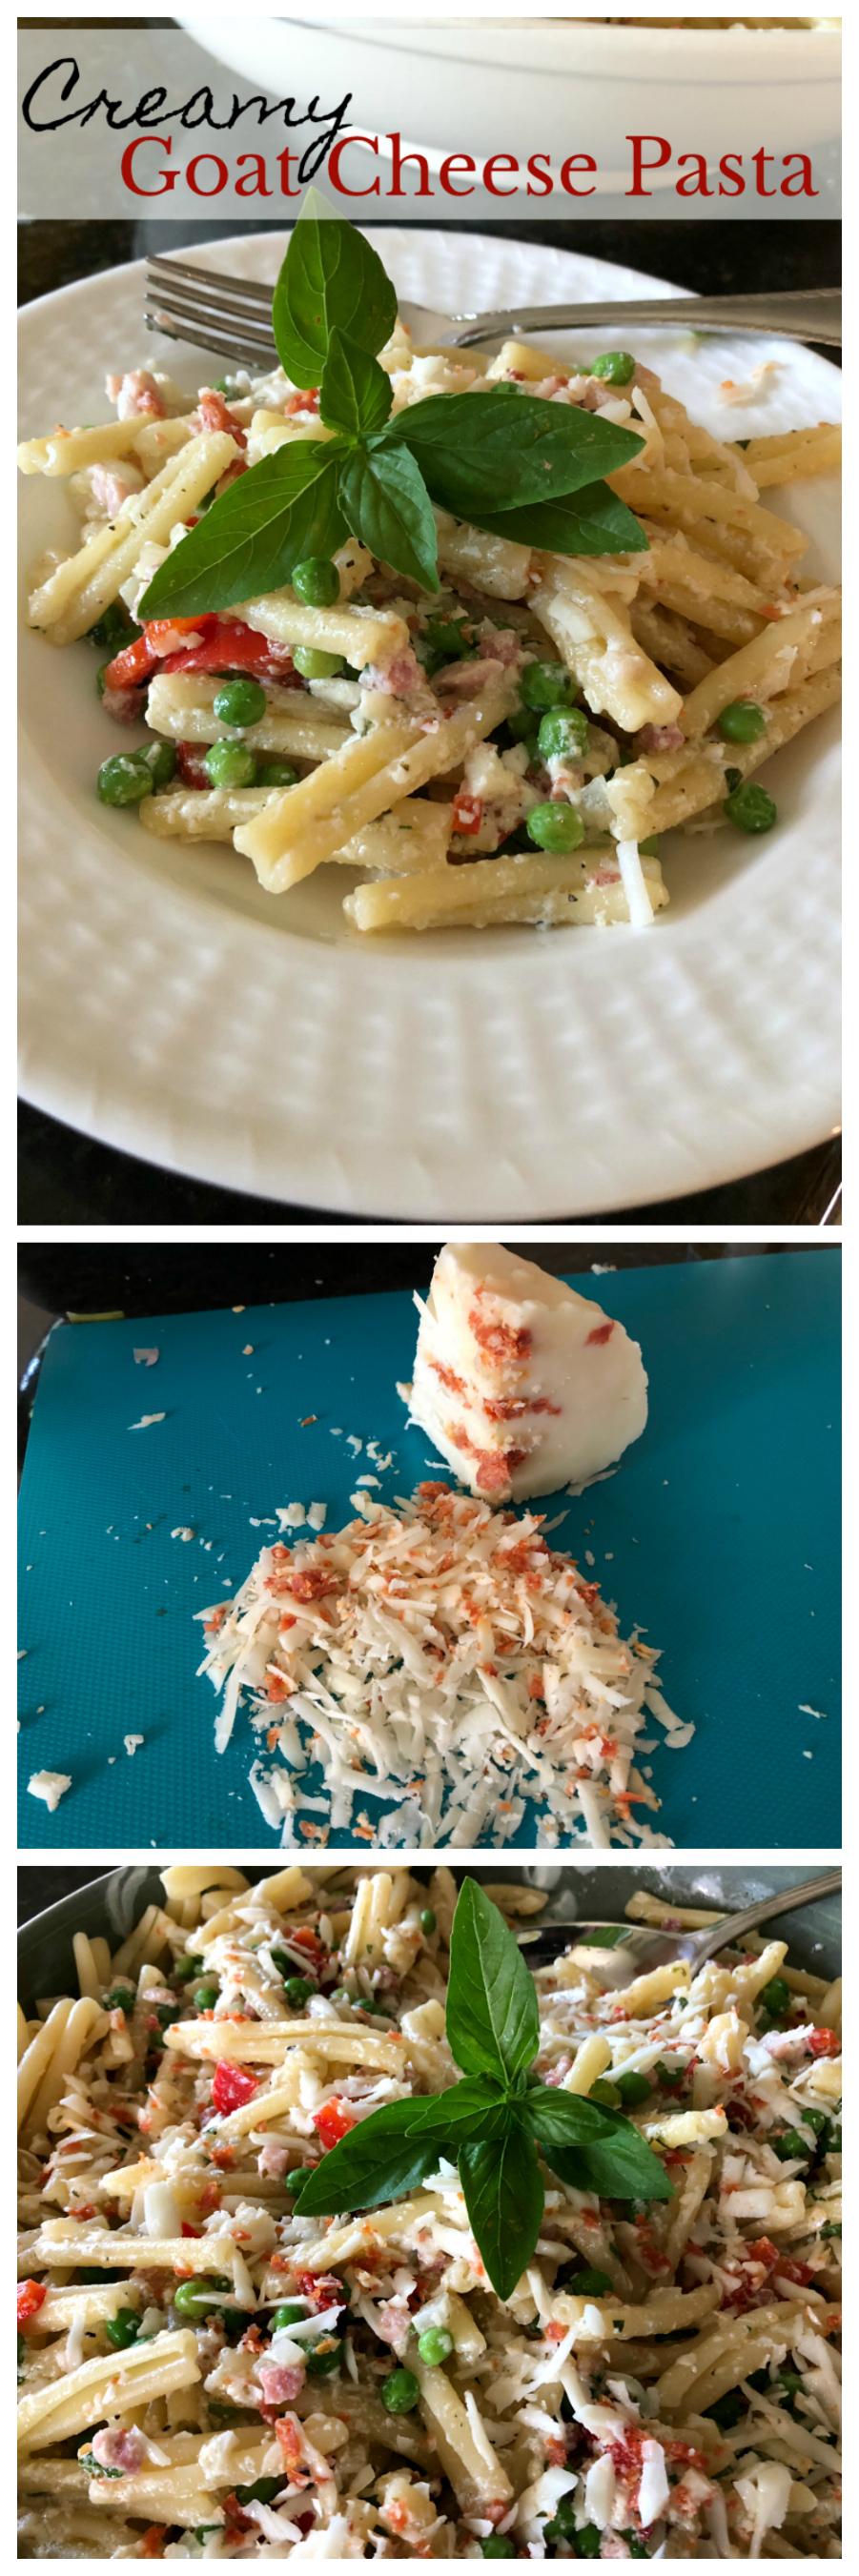 Creamy Goat Cheese Pasta CeceliasGoodStuff.com   Good Food for Good People